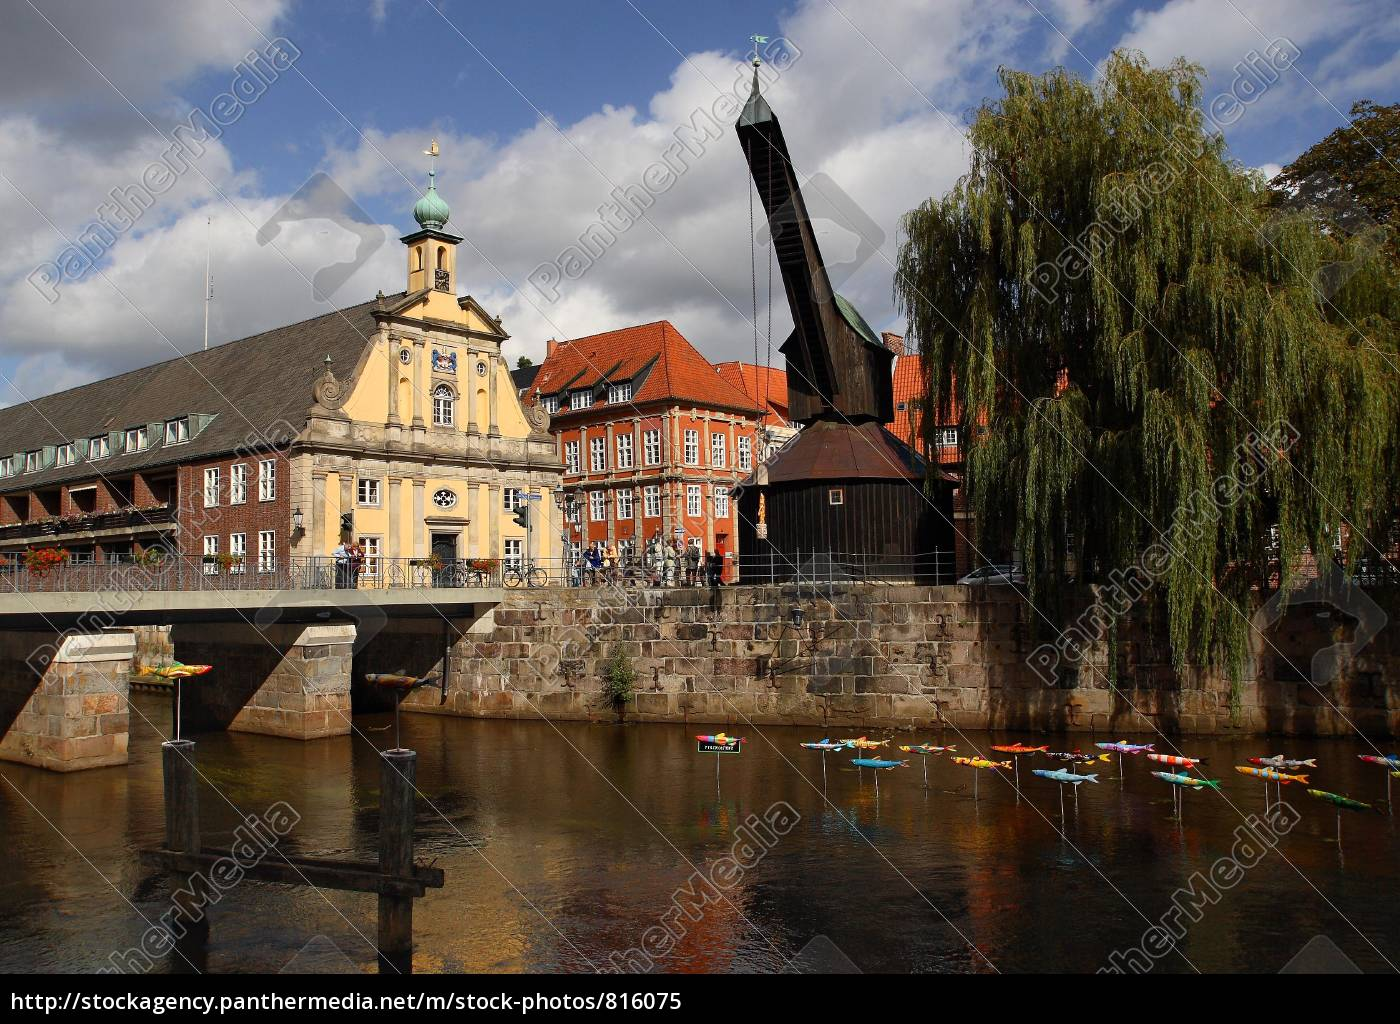 lüneburg., picture, 8 - 816075